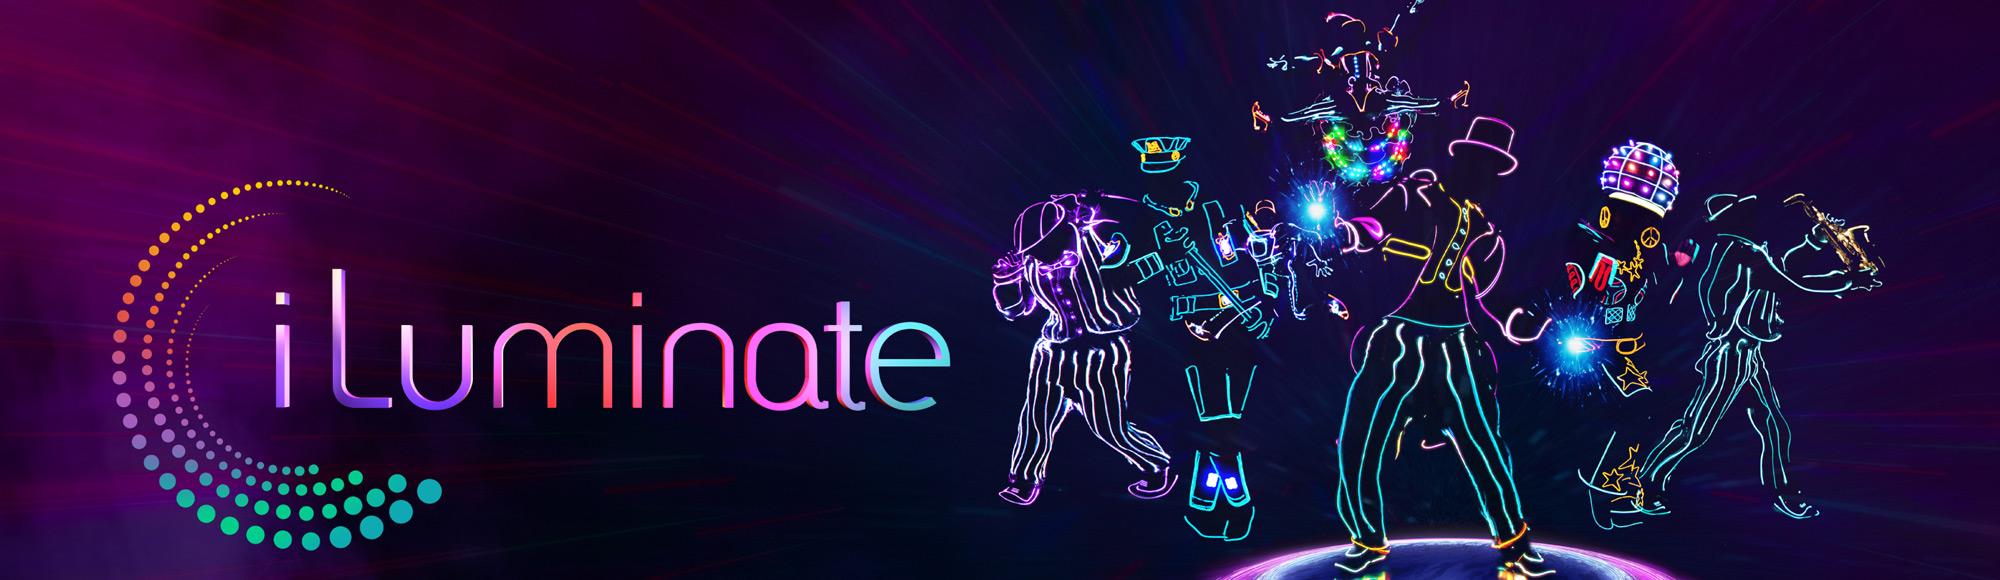 iLuminate show